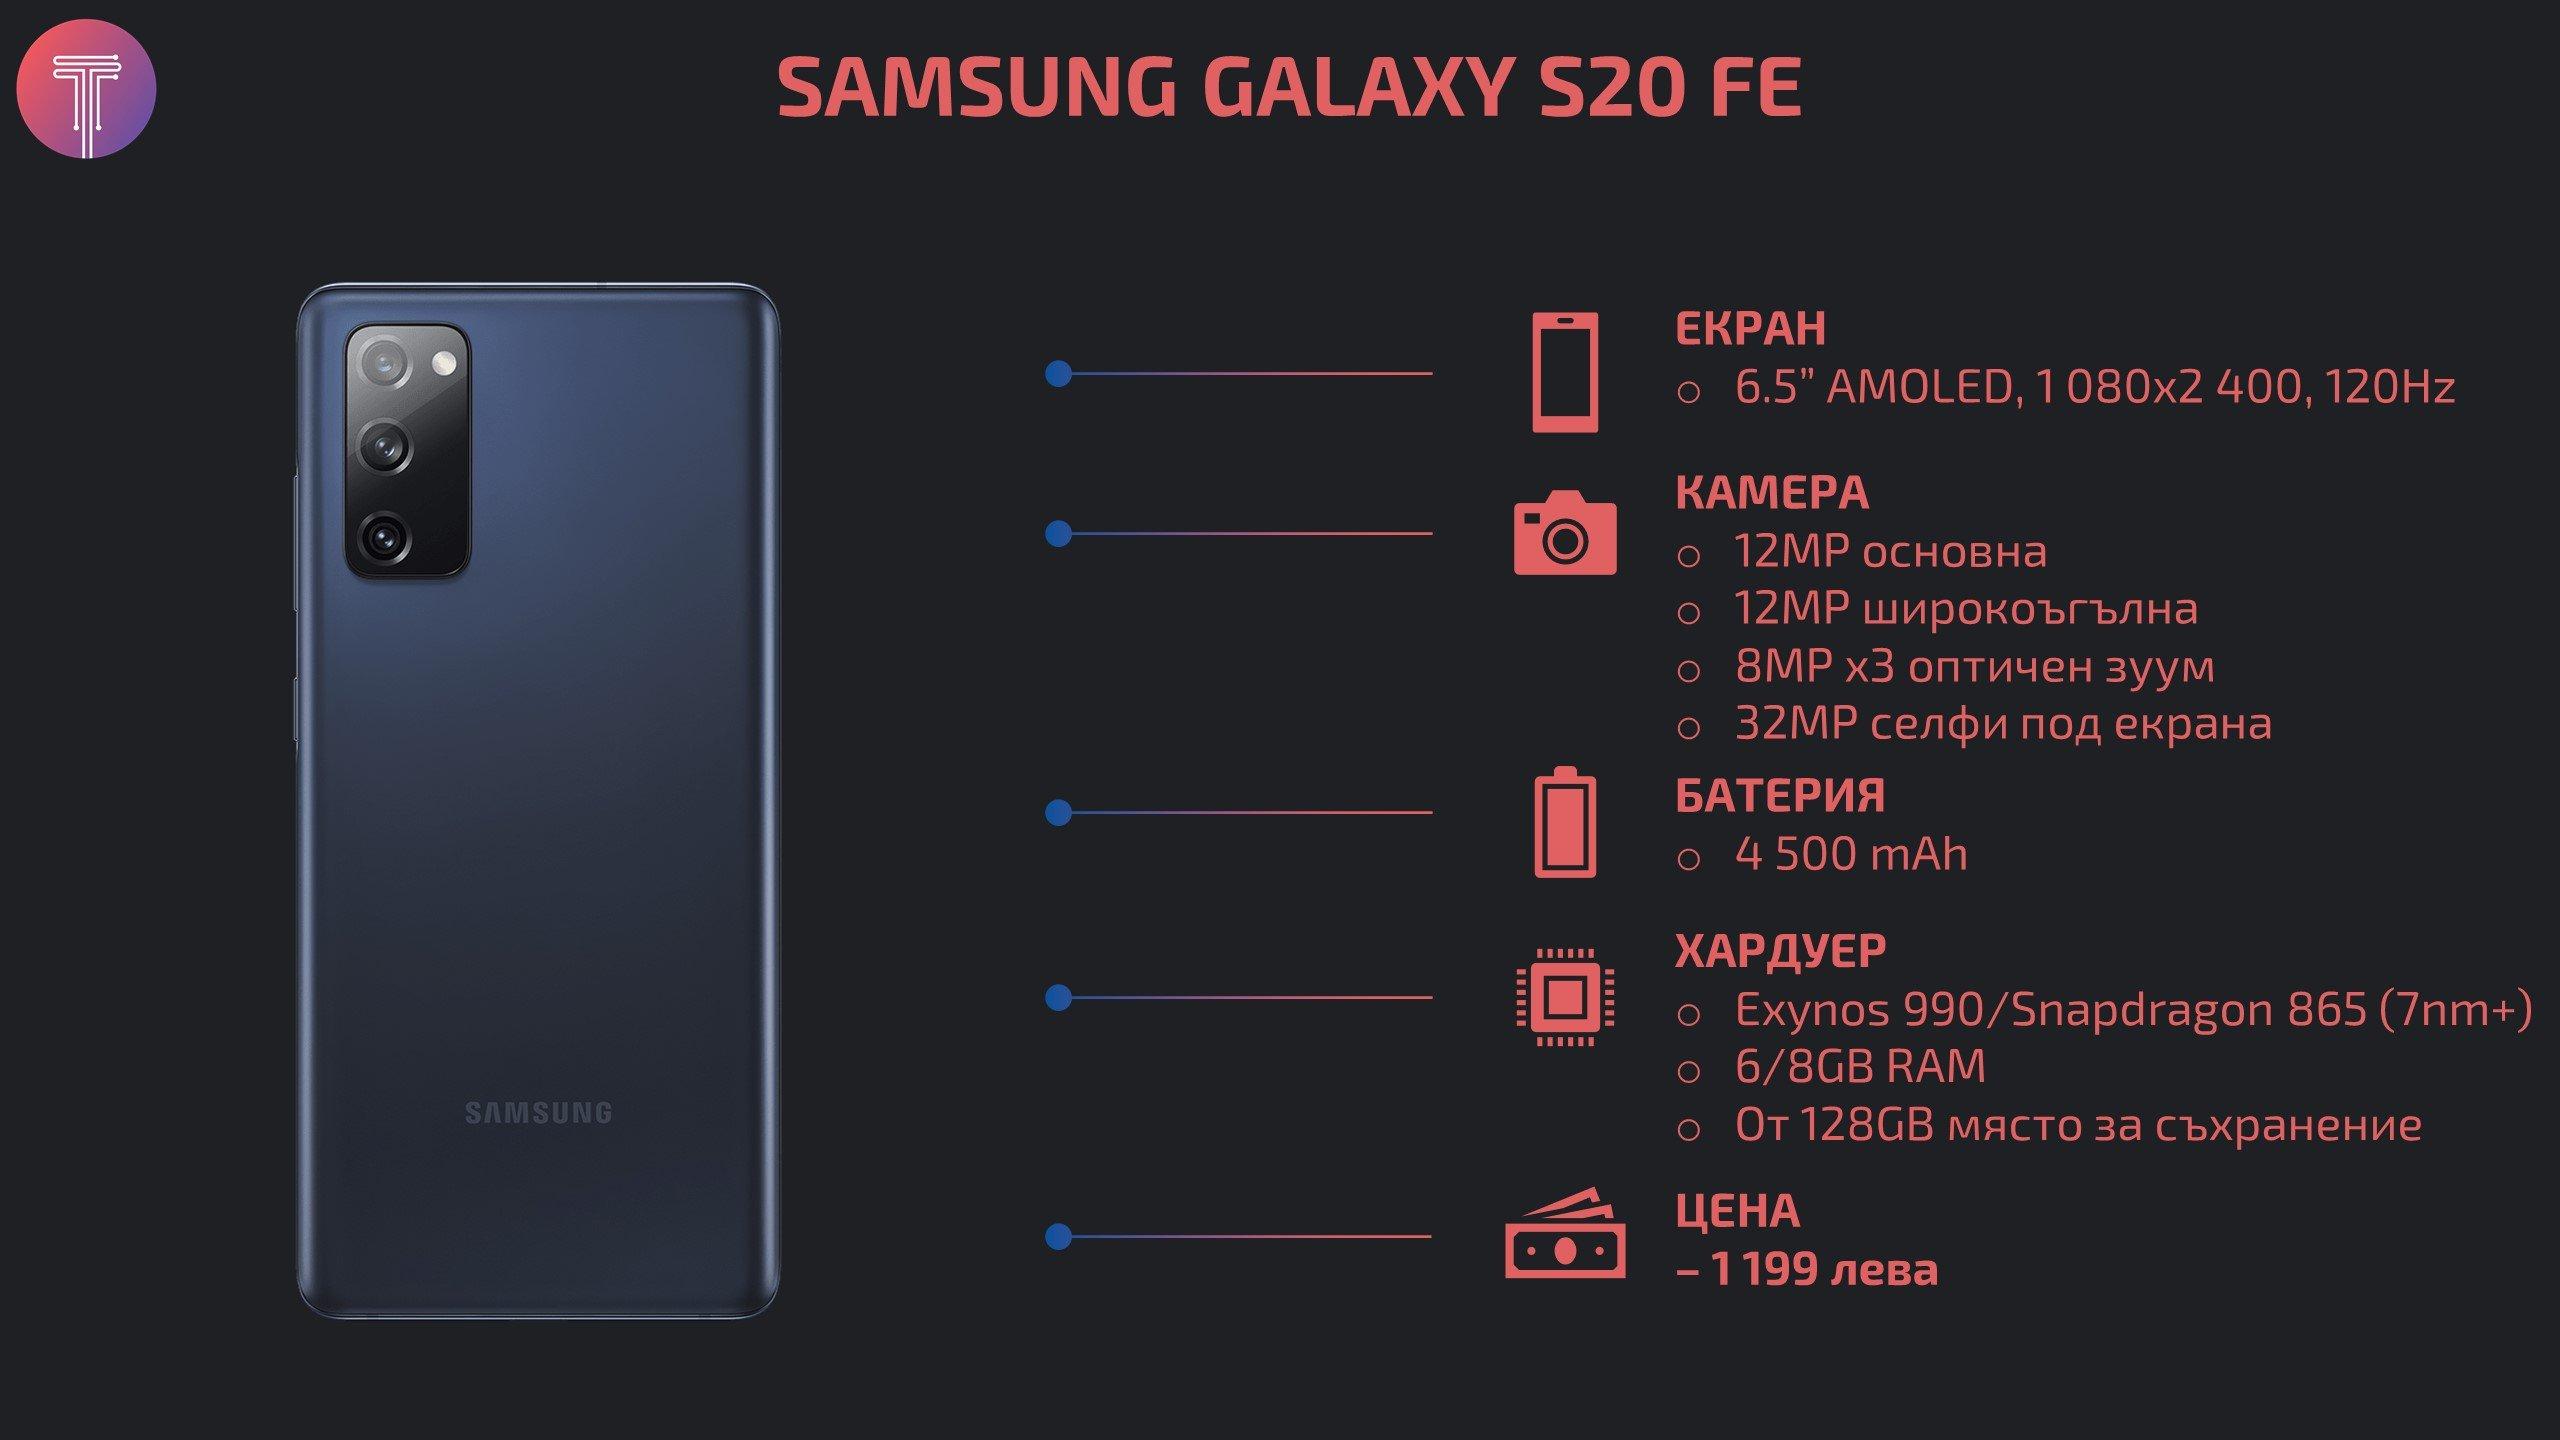 SAMSUNG GALAXY S20 FE Infograph